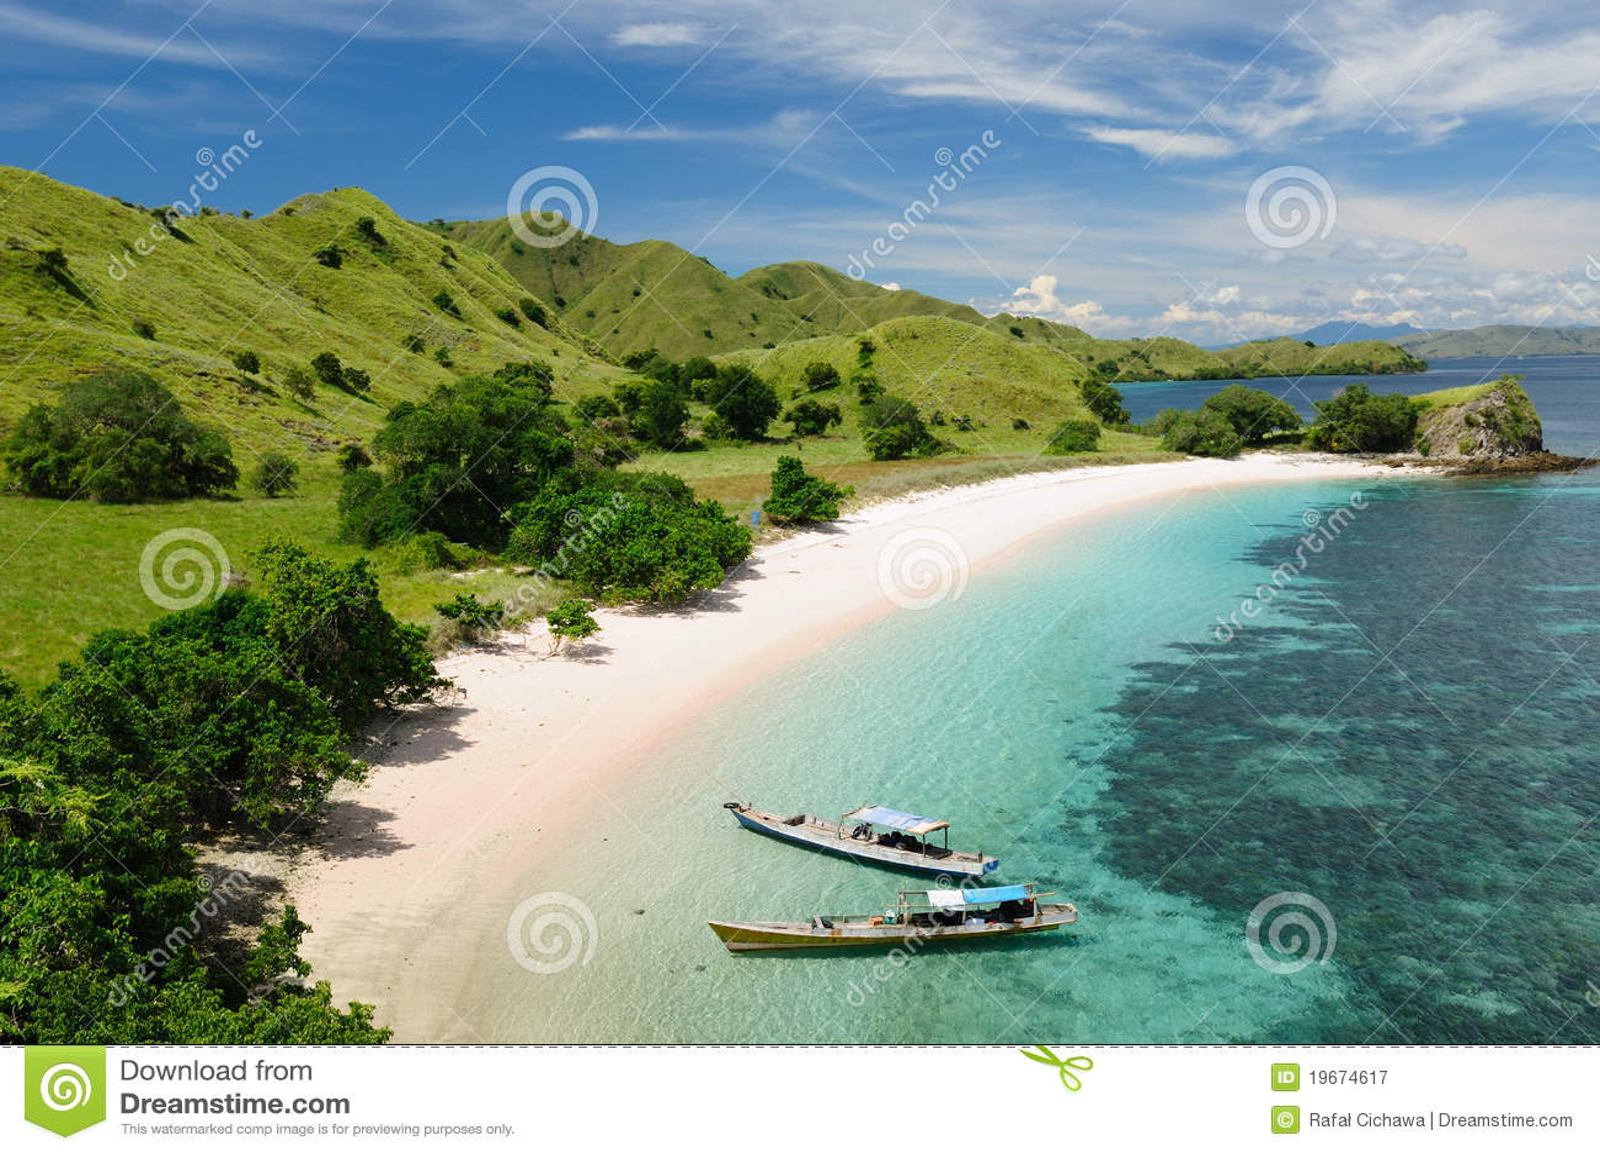 Indonesia Flores Komodo National Park Royalty Free Stock